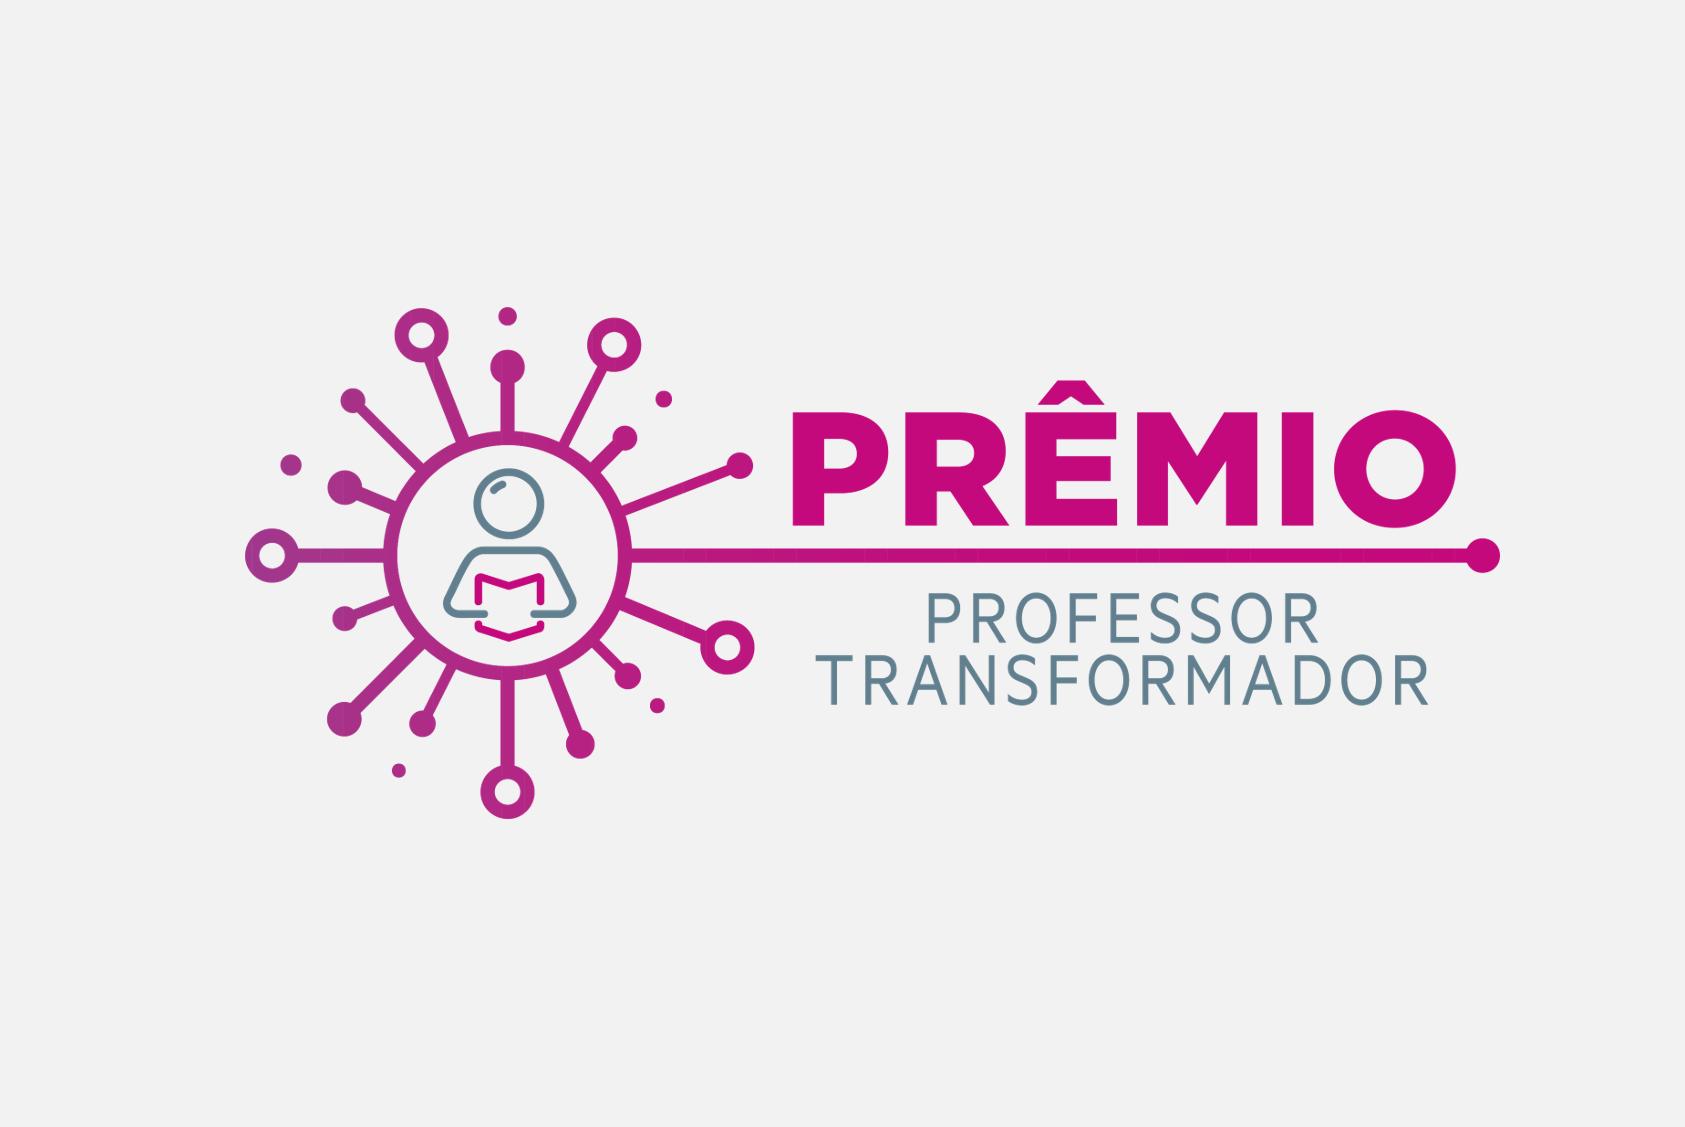 Prêmio Professor Transformador